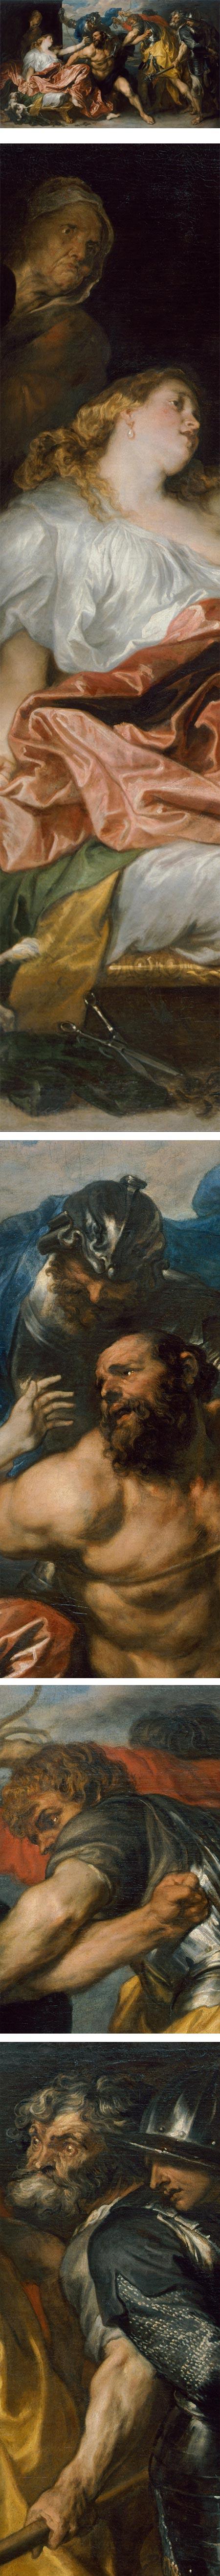 Samson and Delilah, Anton van Dyck